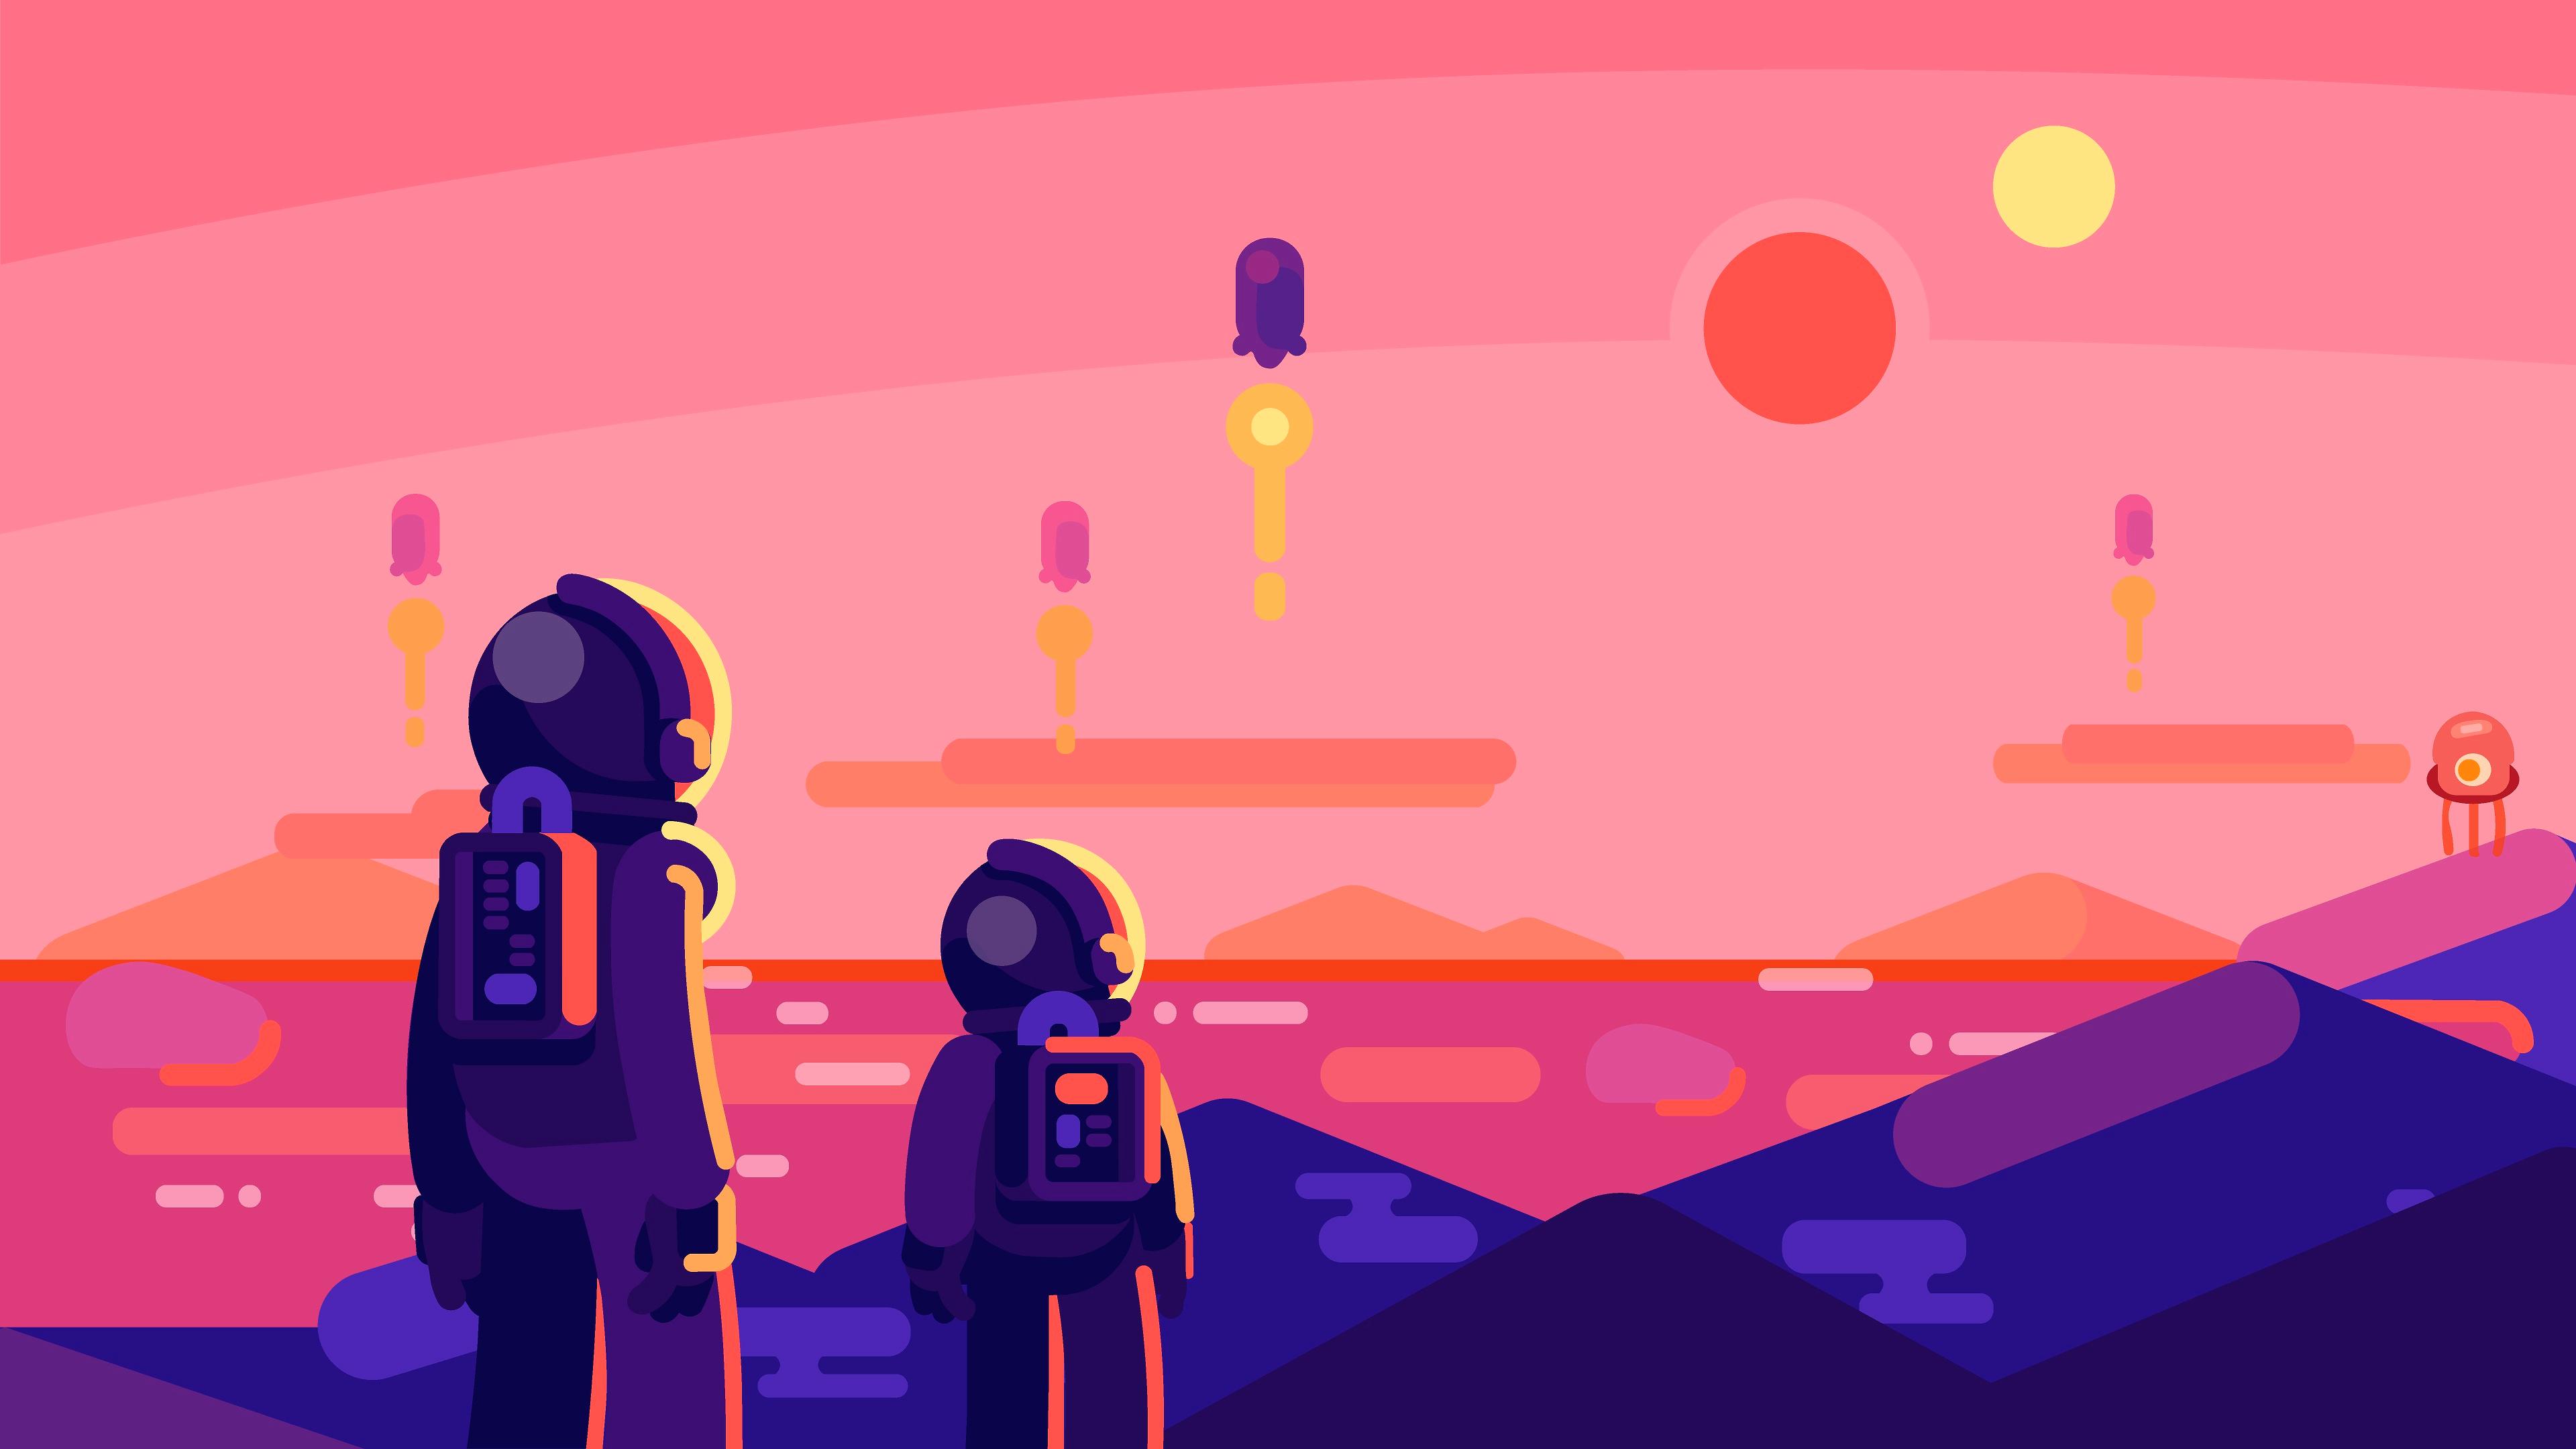 Astronaut 4k Ultra Hd Wallpaper Background Image 3840x2160 Id 1029683 Wallpaper Abyss